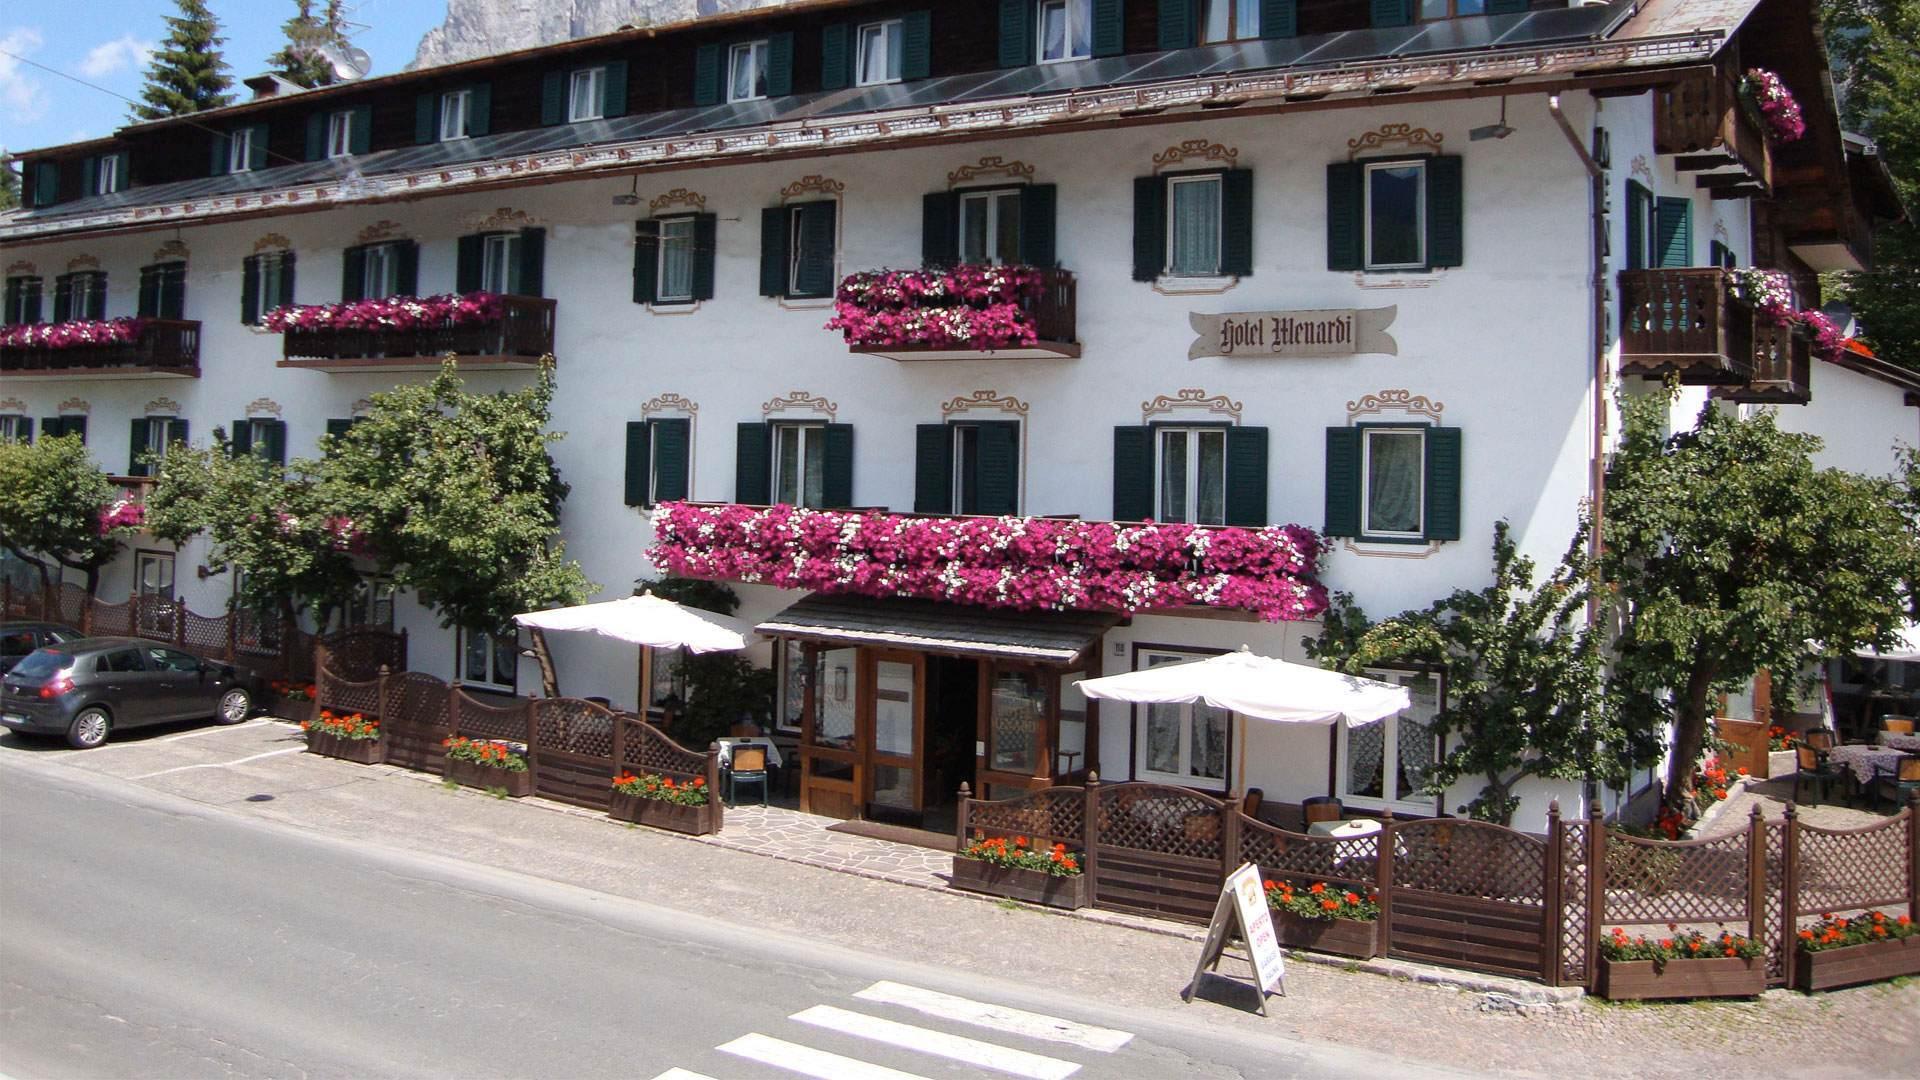 Air Service Center Cortina.Location Hotel Menardi Cortina D Ampezzo